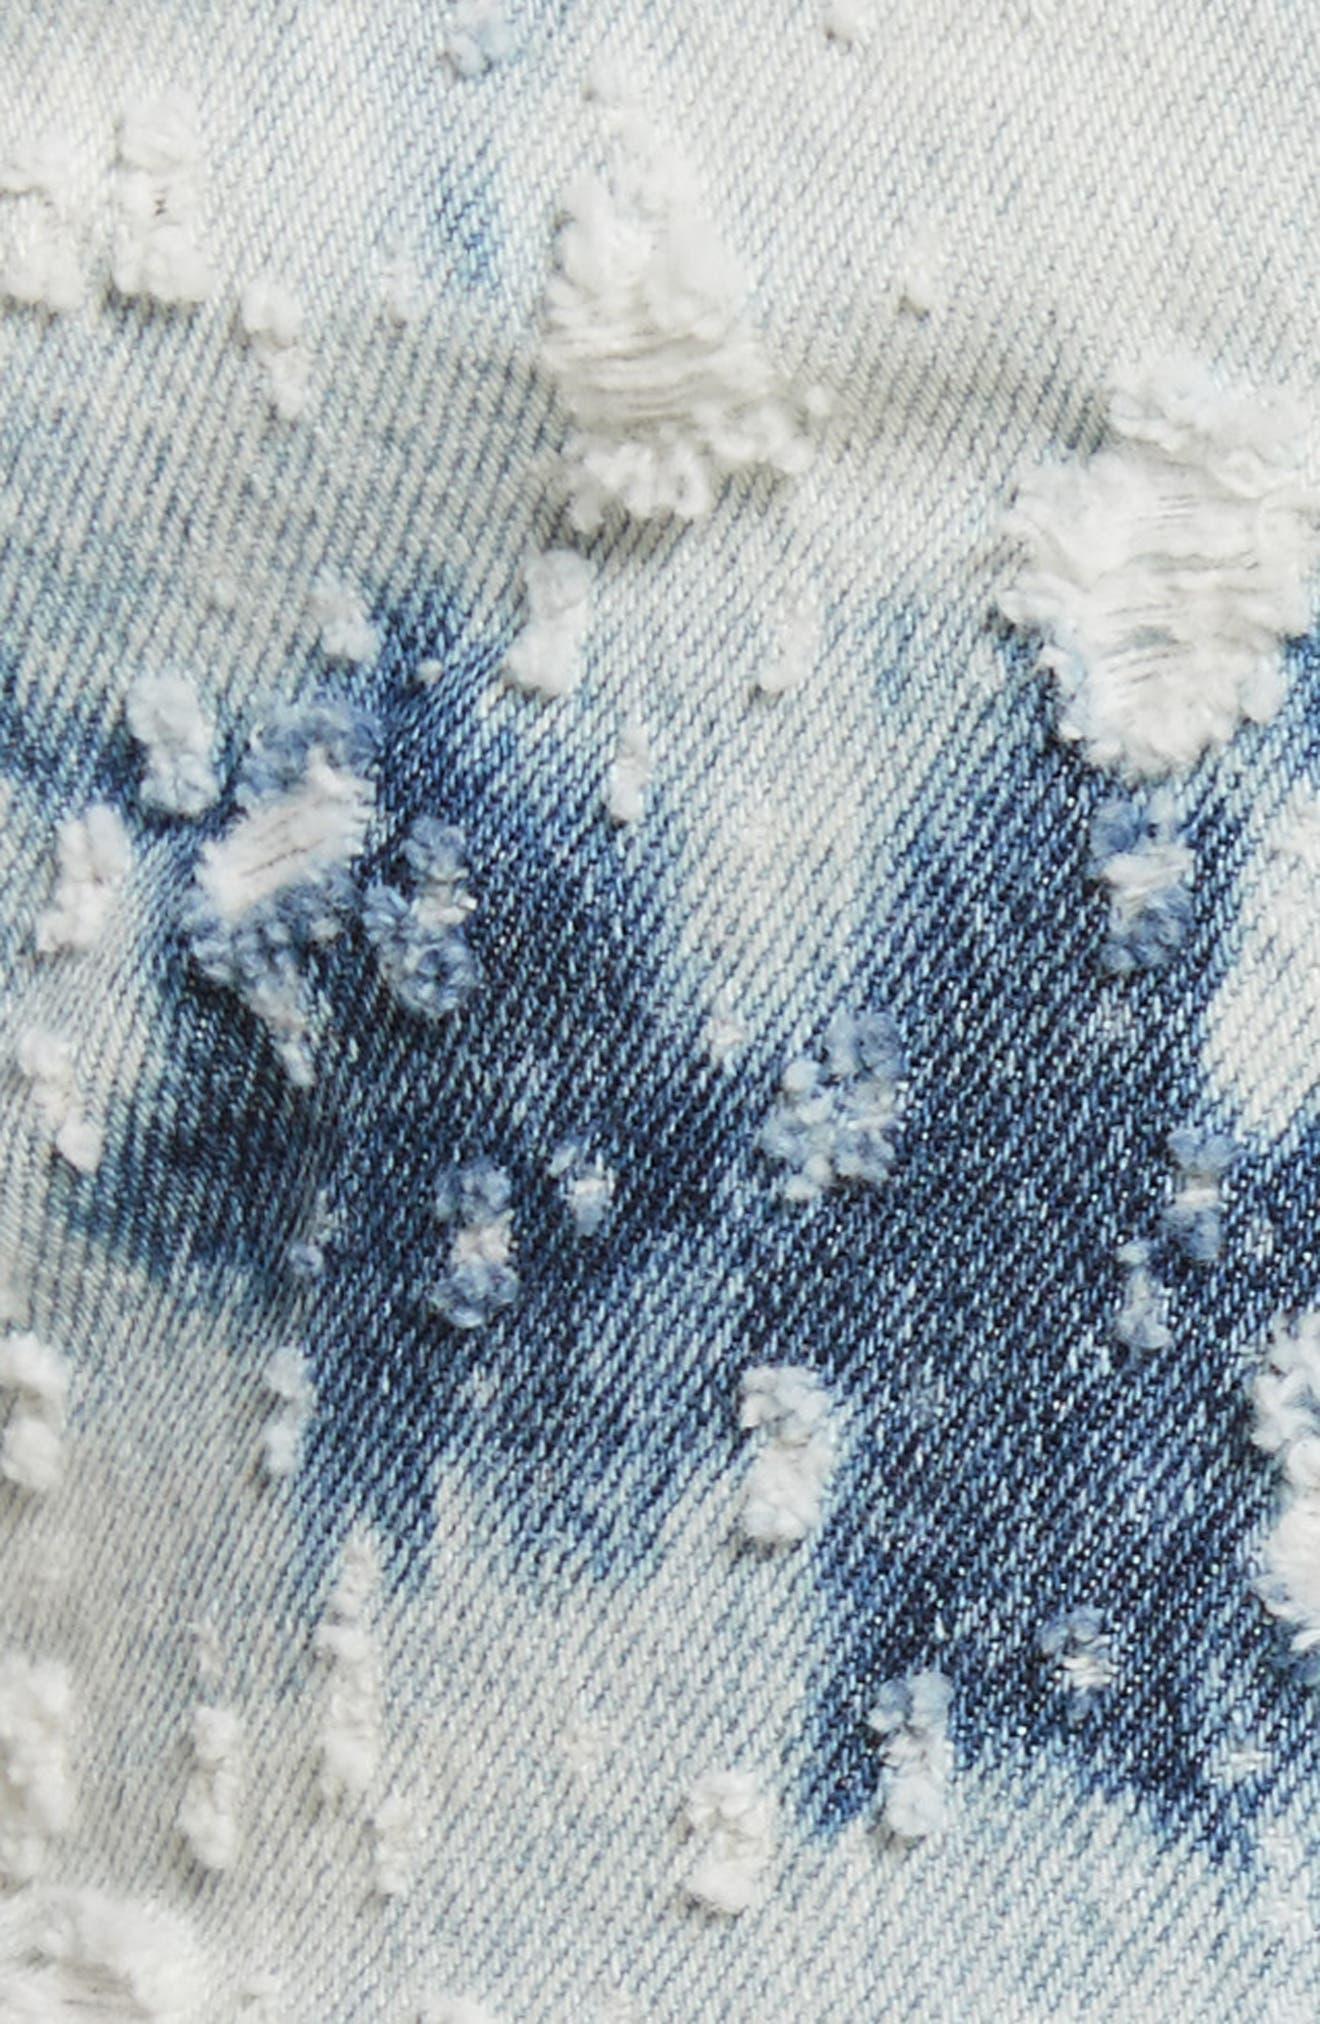 Denim x Alexander Wang Shadow Ripped Denim Shorts,                             Alternate thumbnail 5, color,                             Bleached Destroy